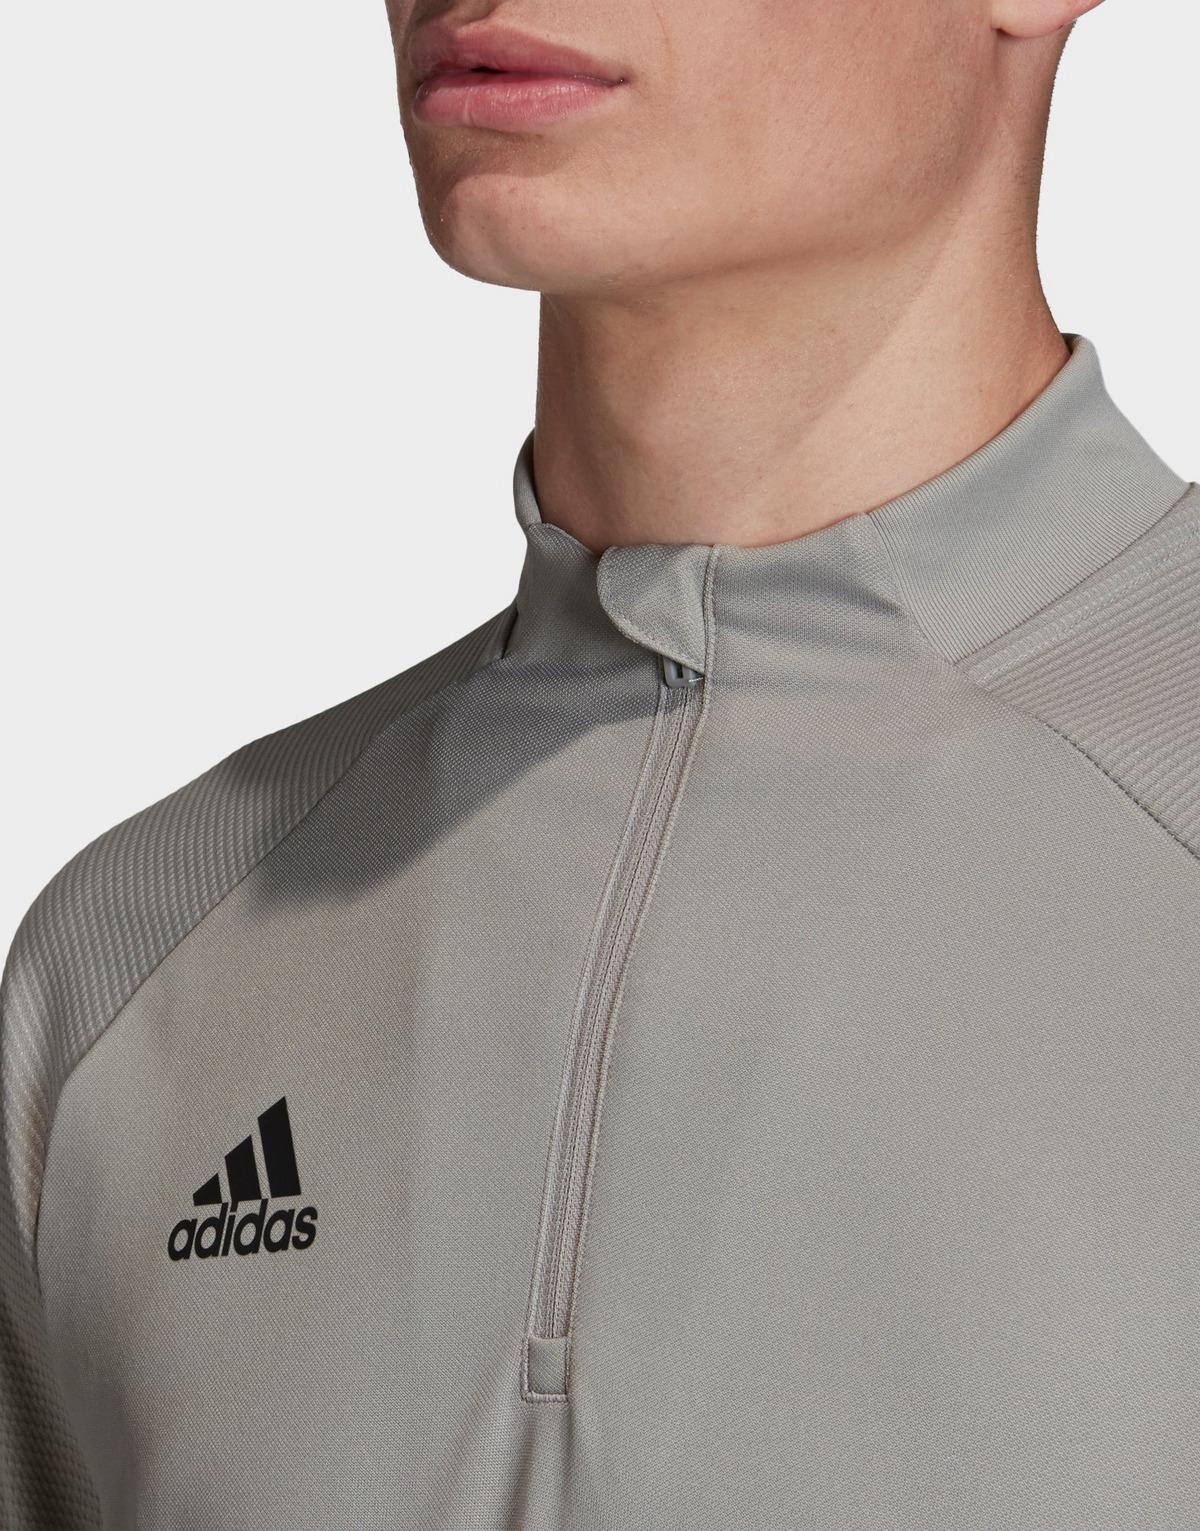 Adidas Performance Condivo 20 Training Top